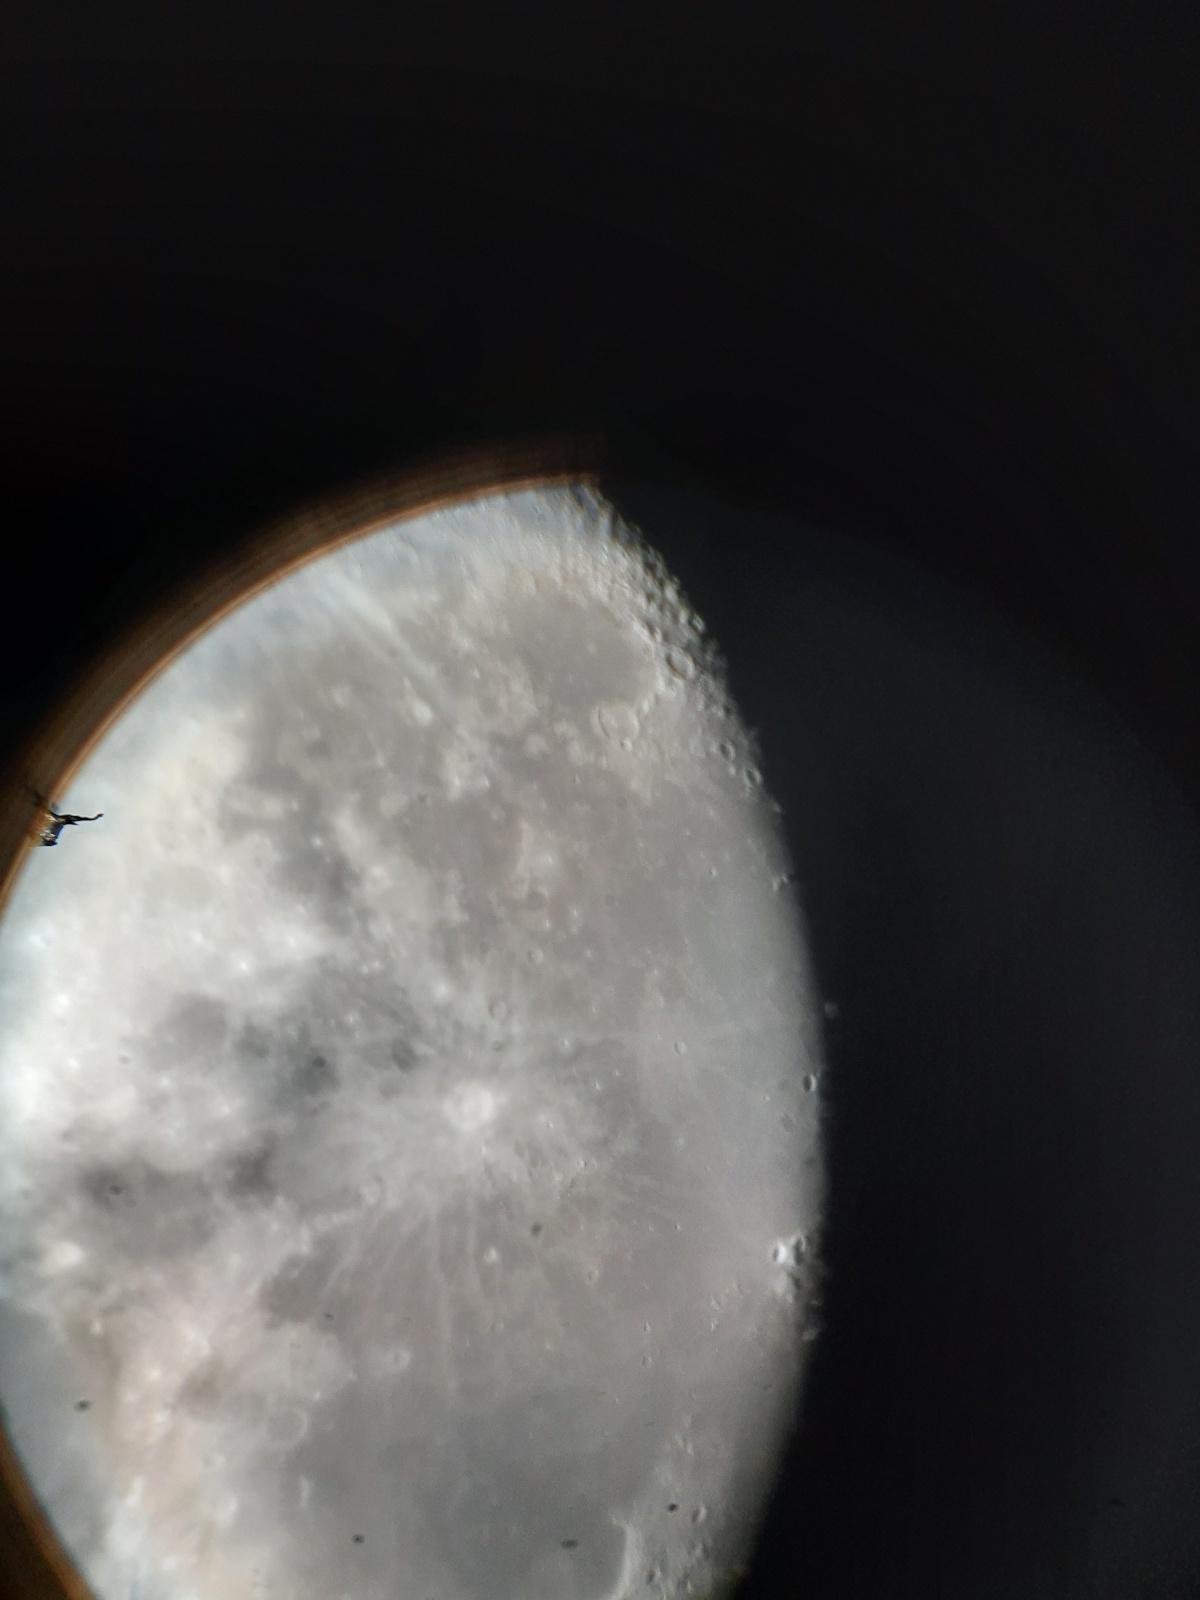 44139298_20201226_moon33x.jpg